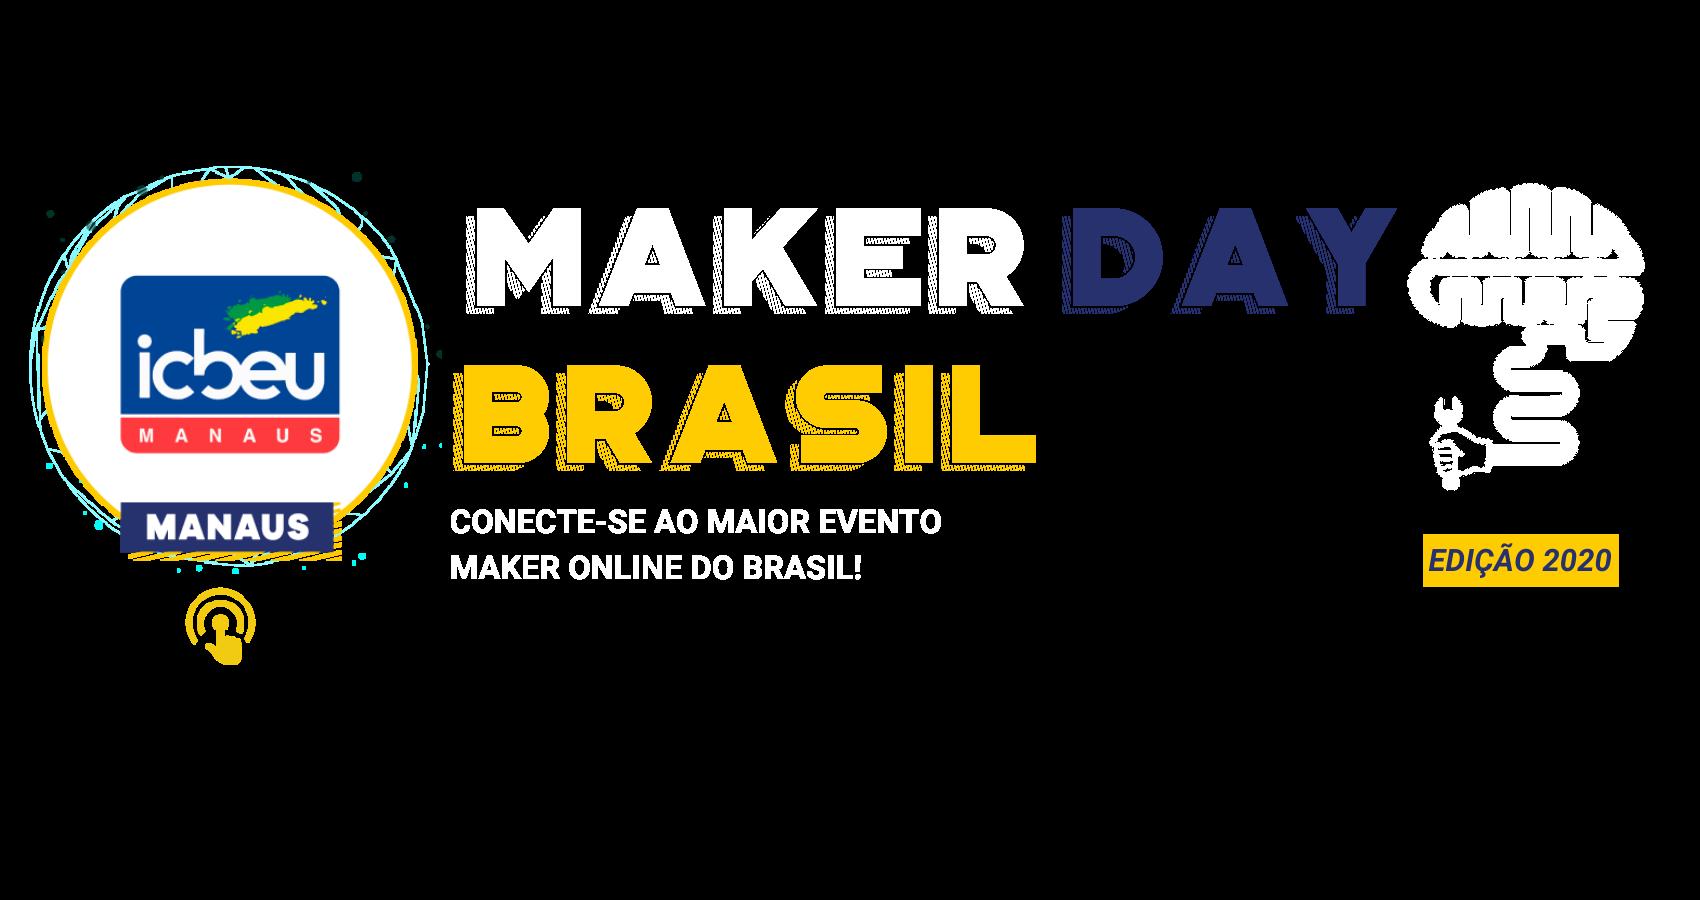 Maker Day Brasil Capa Manaus